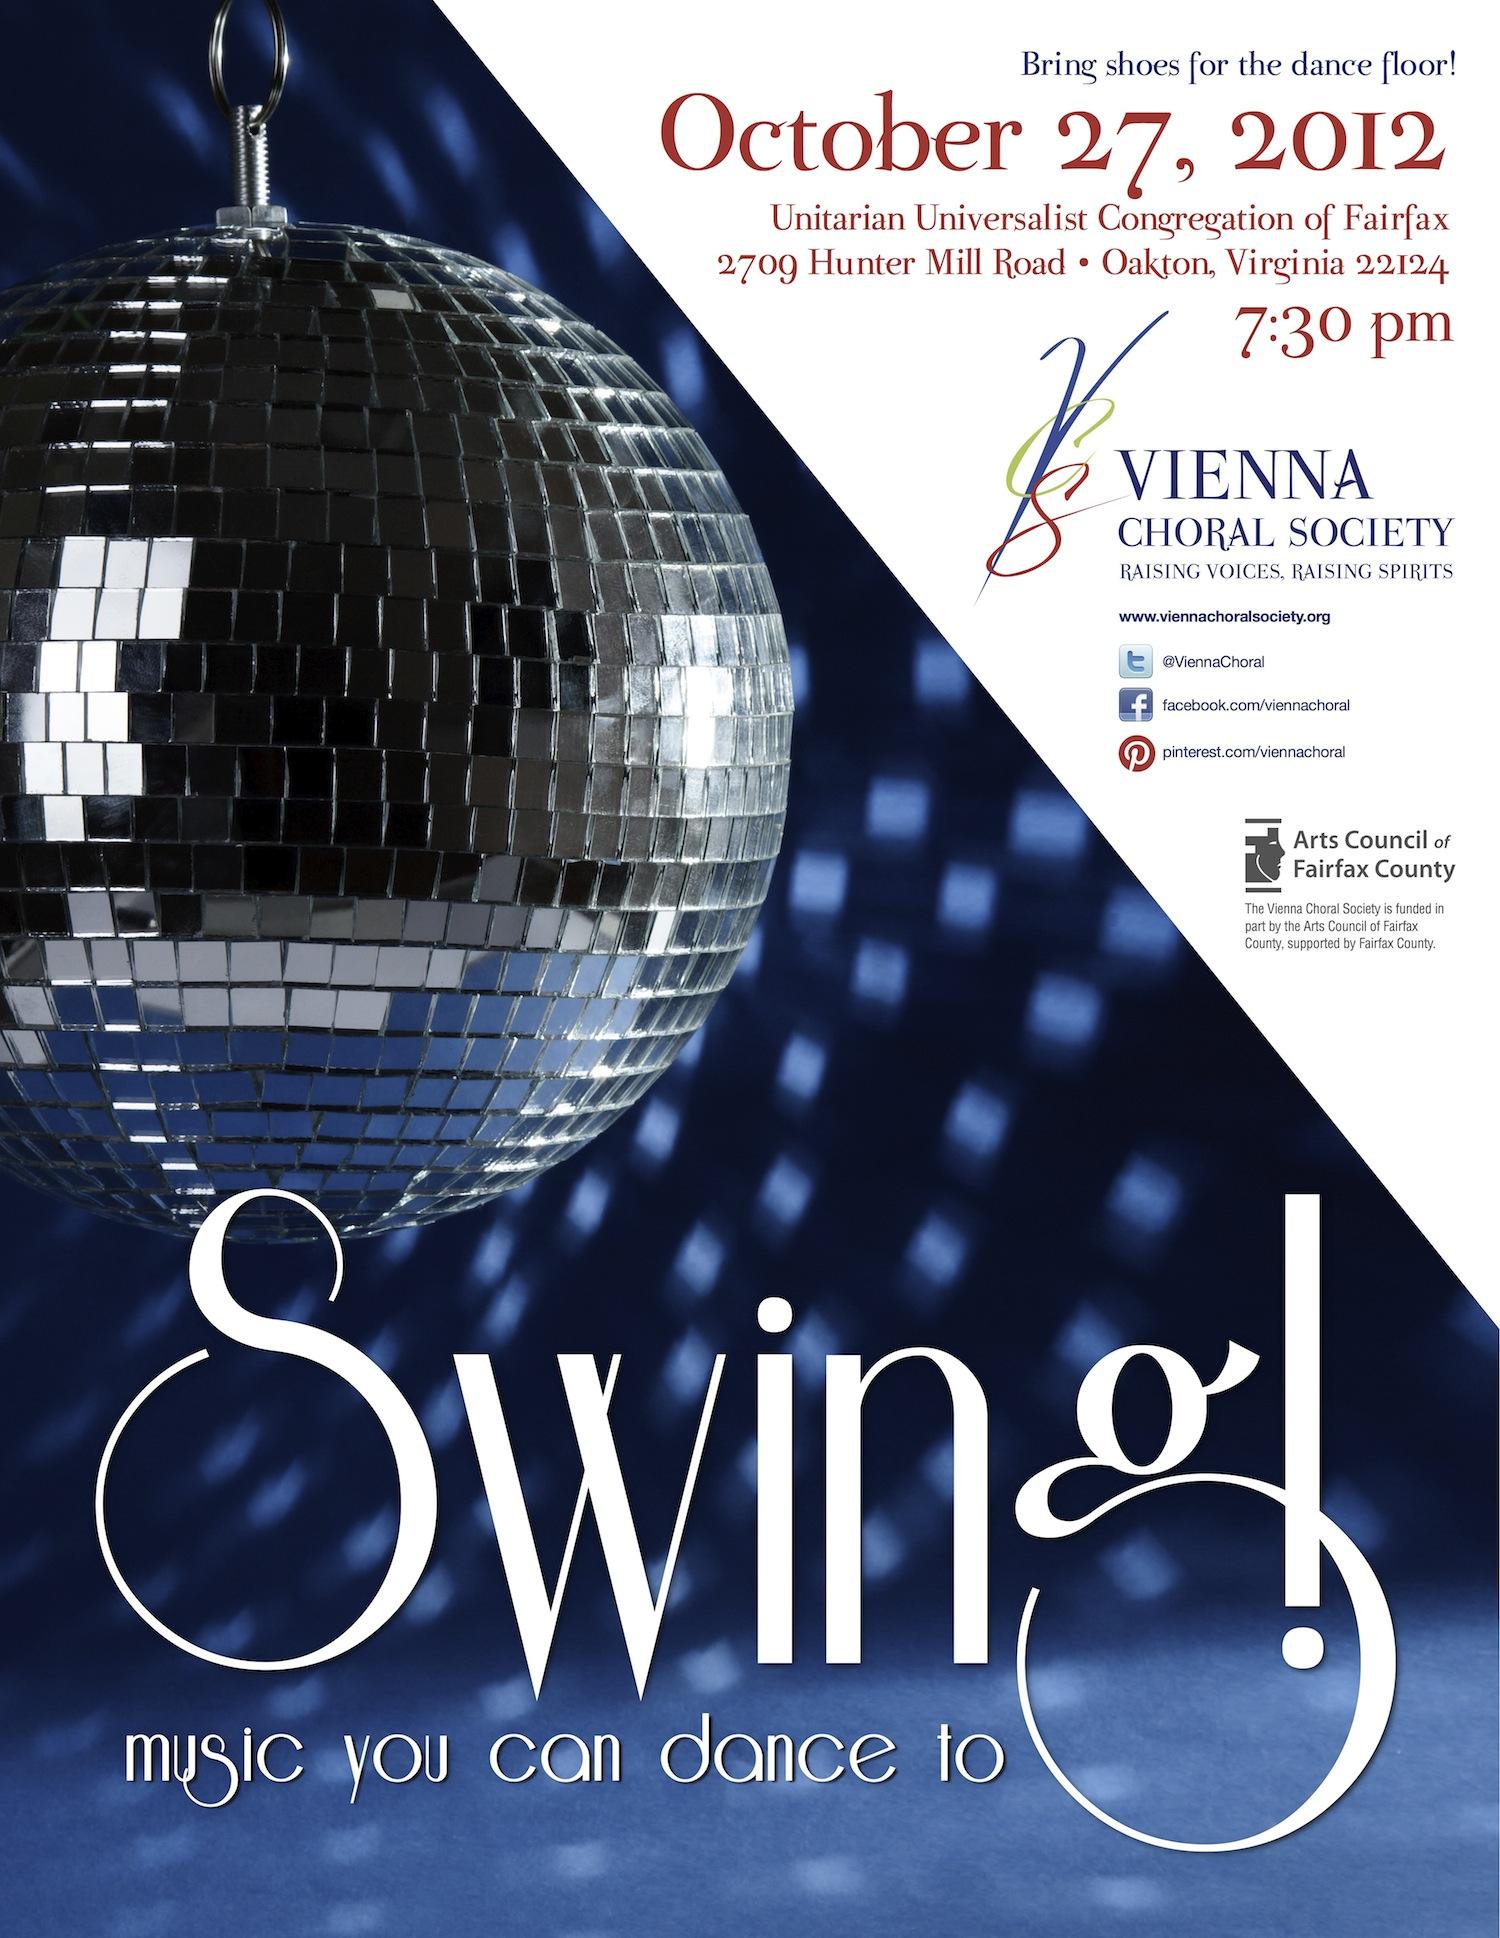 VCS 2012 Swing!